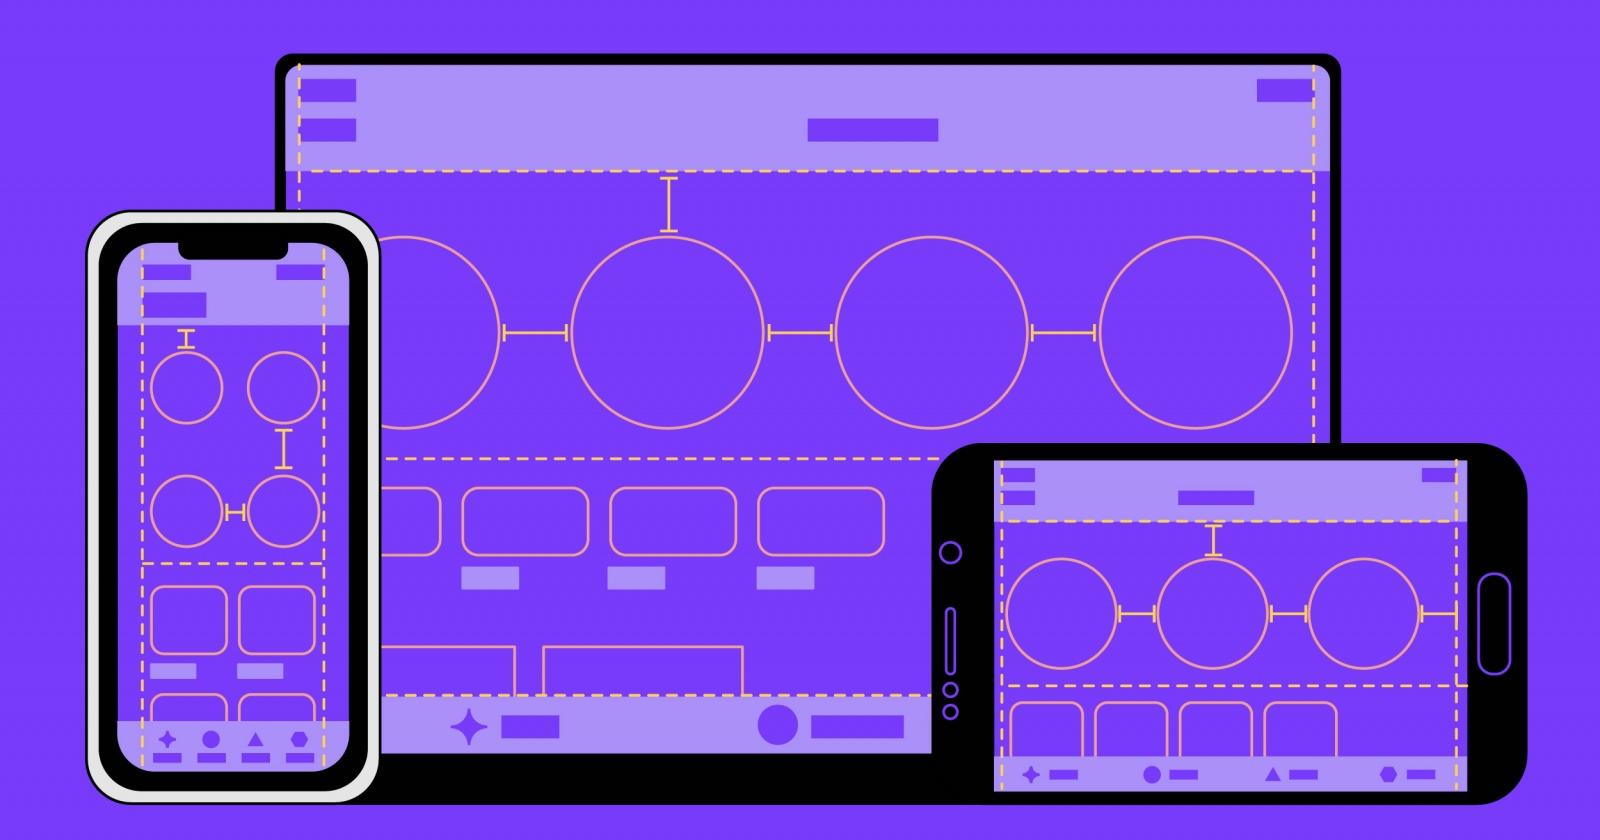 Реализуем UI в iOS: улучшаем, ускоряем, масштабируем - 1